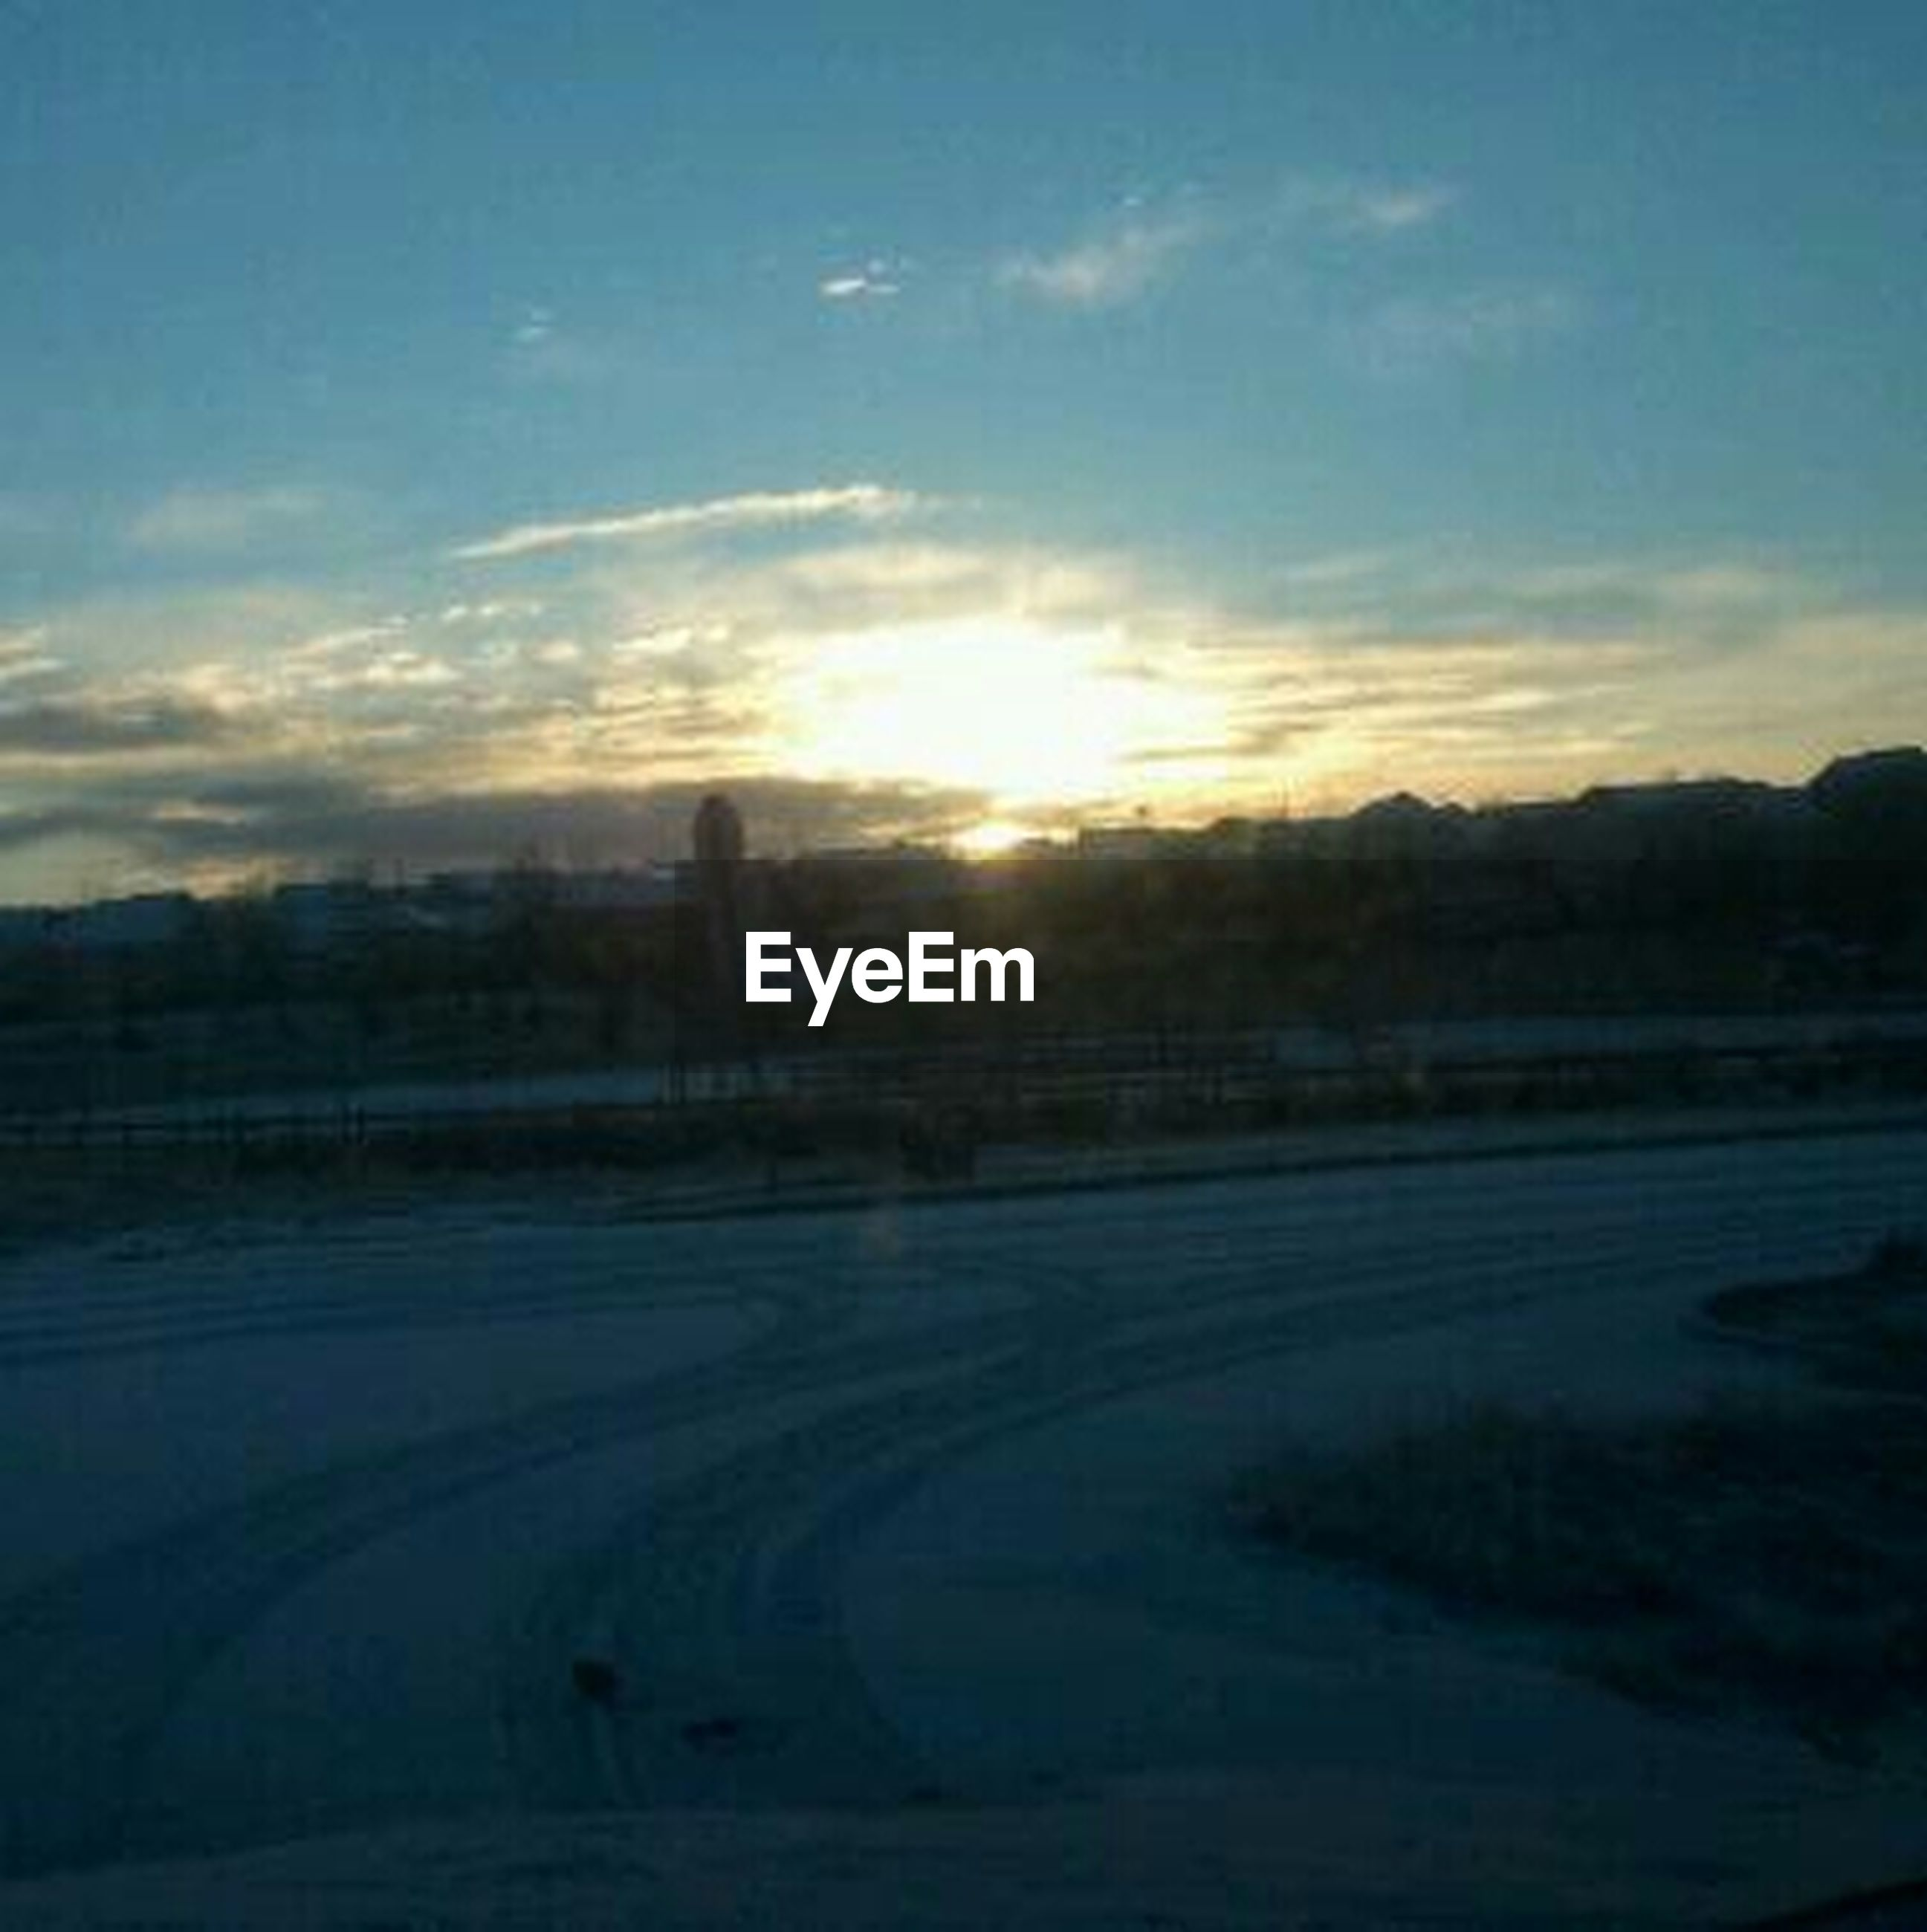 sunset, sky, landscape, scenics, tranquil scene, road, tranquility, beauty in nature, nature, cloud - sky, transportation, silhouette, sun, sunlight, field, idyllic, cloud, outdoors, tree, no people